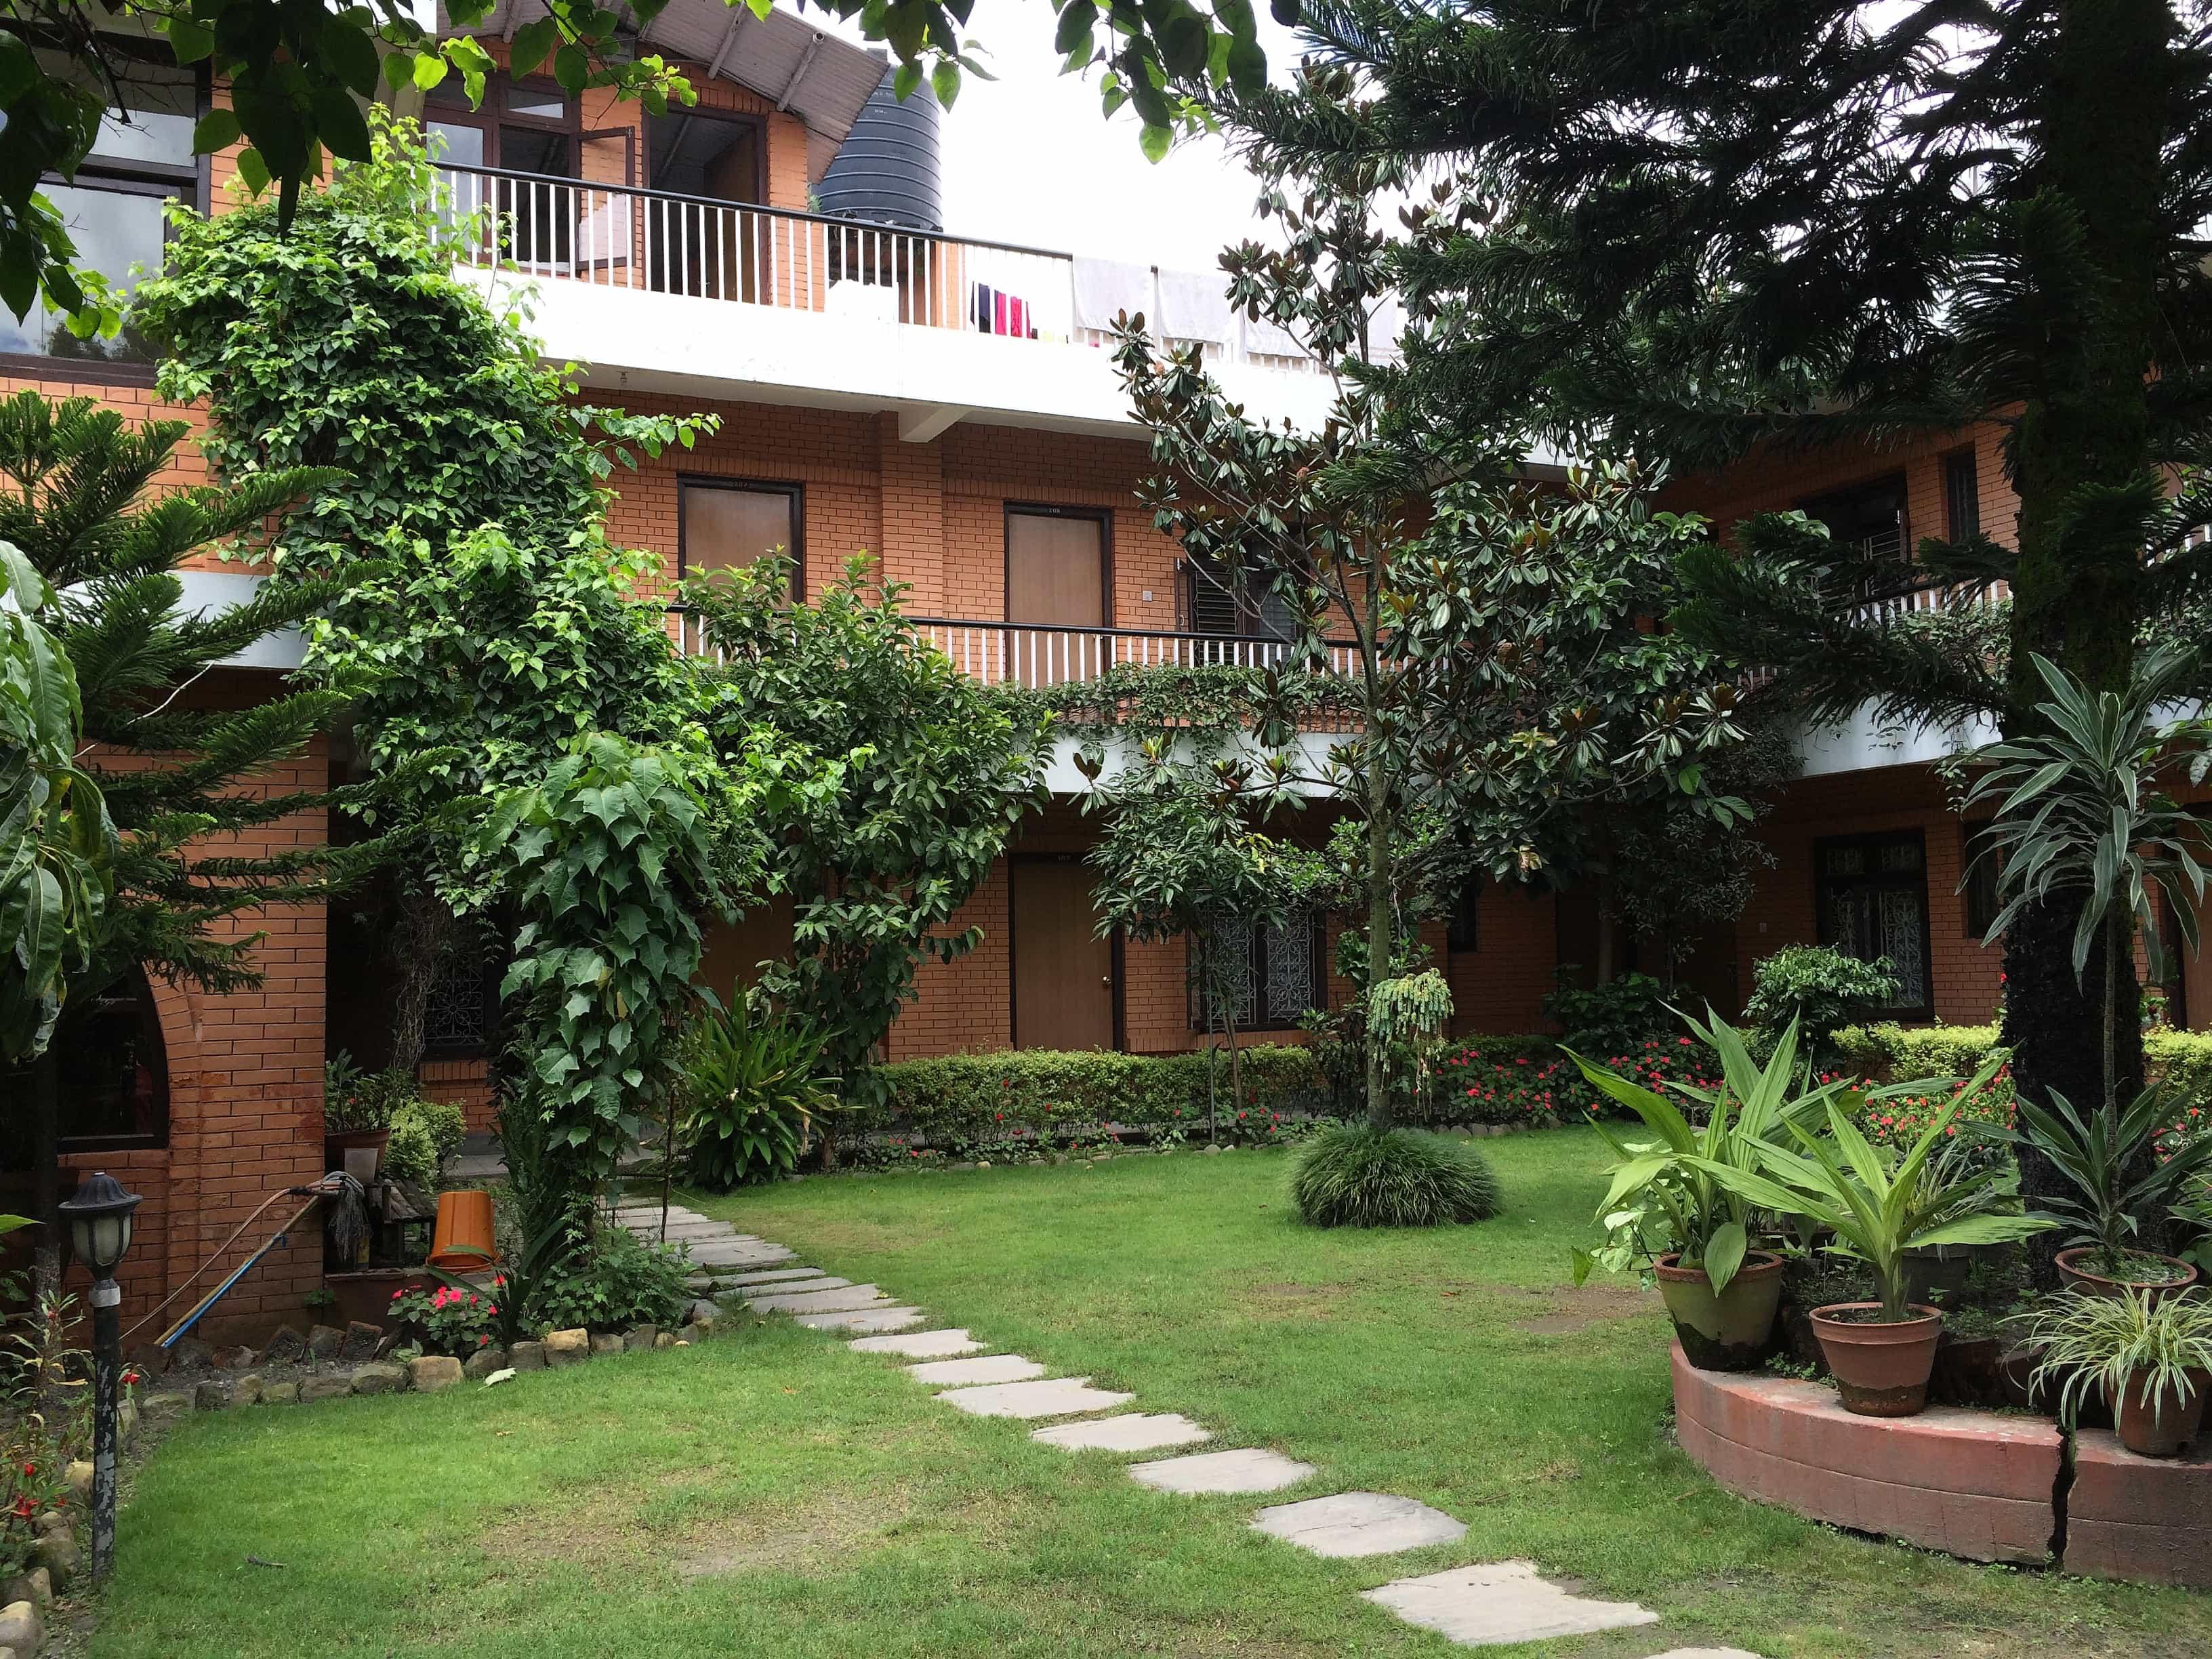 Guesthouse of Shechen Monastery, Kathmandu